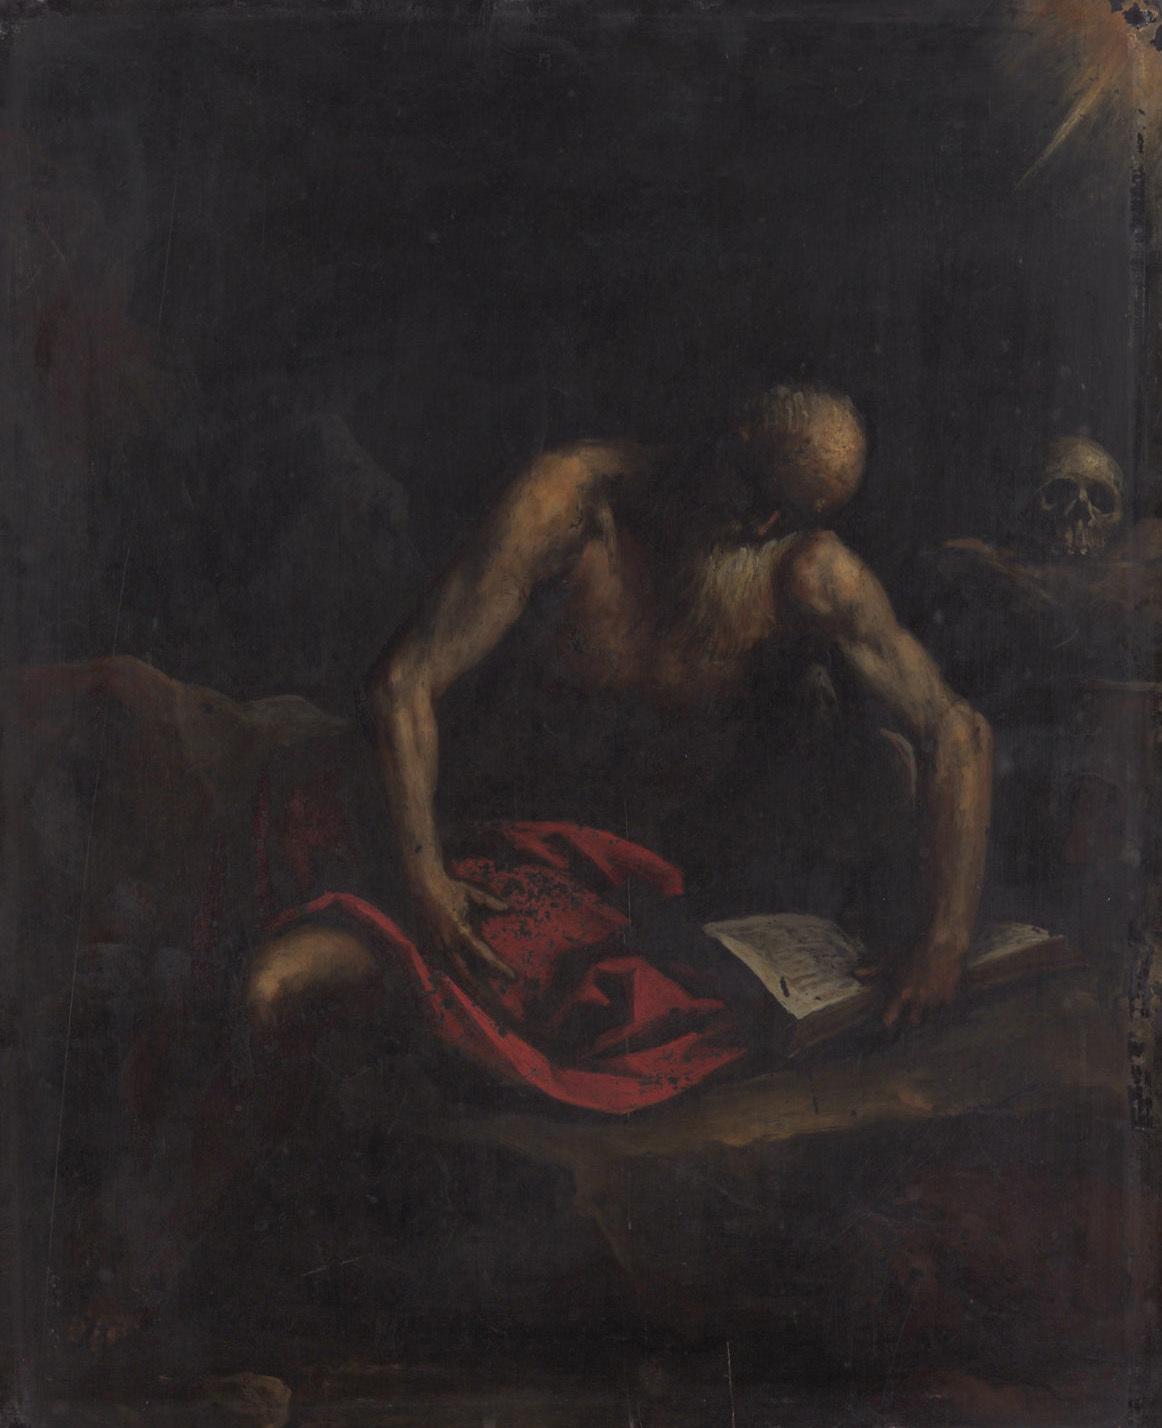 Hl. Hieronymus von Jacopo Negretti, gen. Palma il Giovane